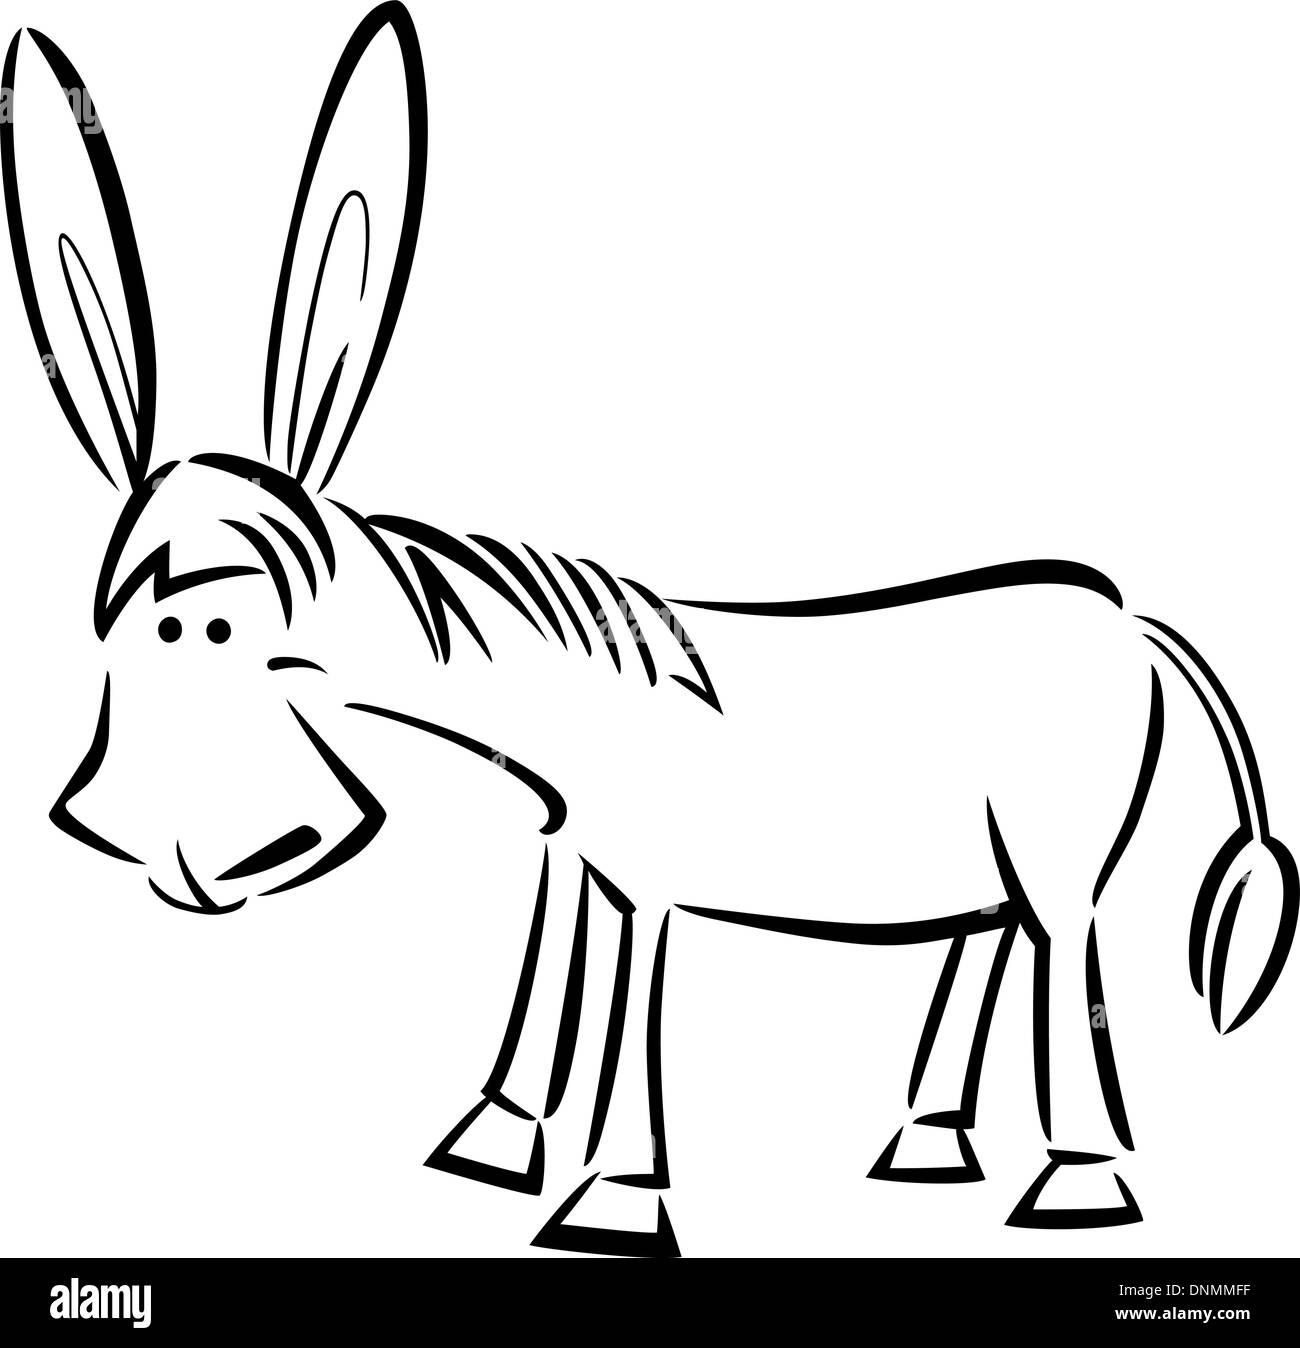 Cartoon-Illustration der süße Esel für Malbuch Vektor Abbildung ...